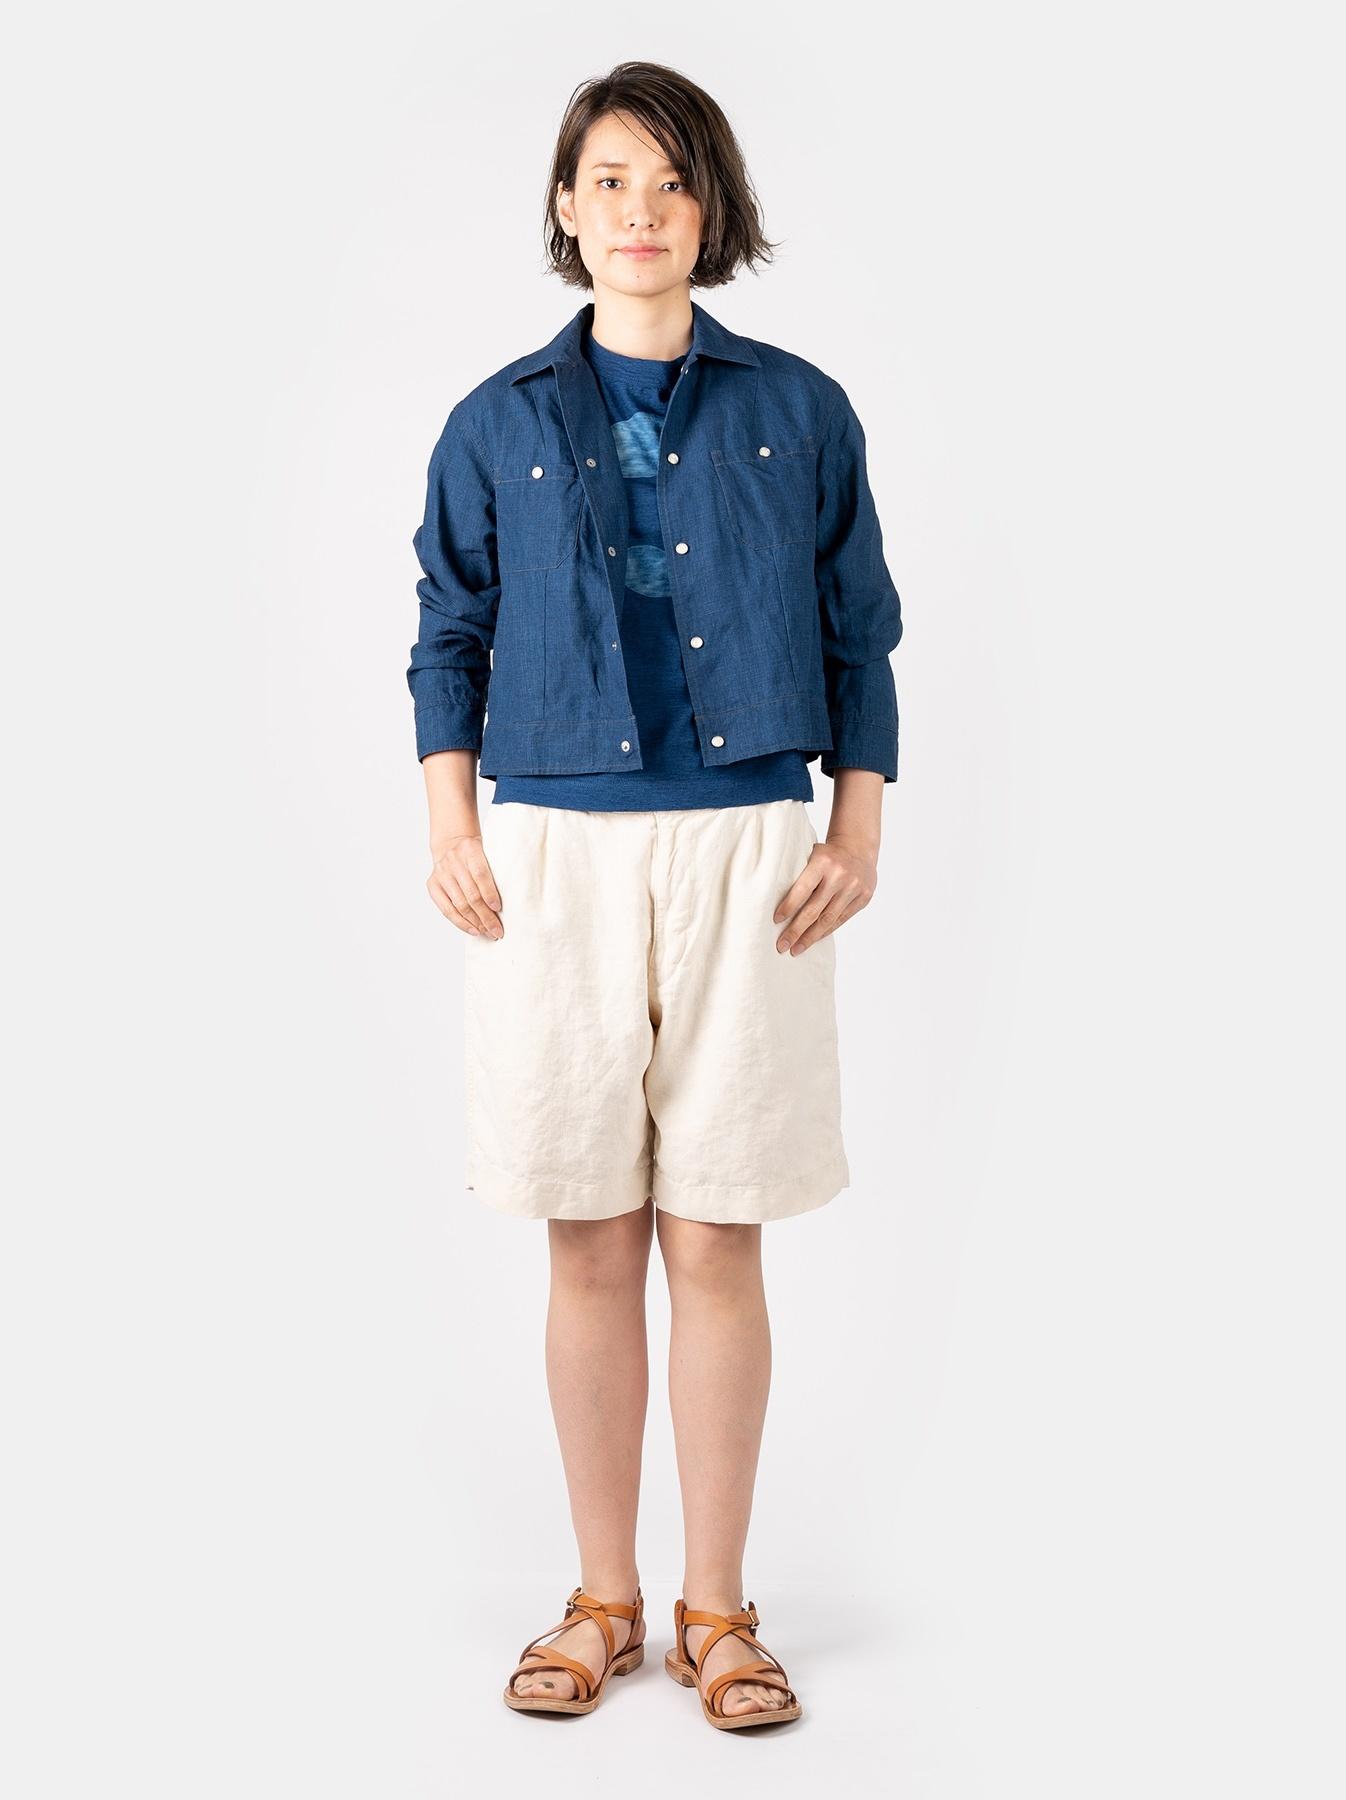 WH Indigo Linen Jean Jacket Bolero-2